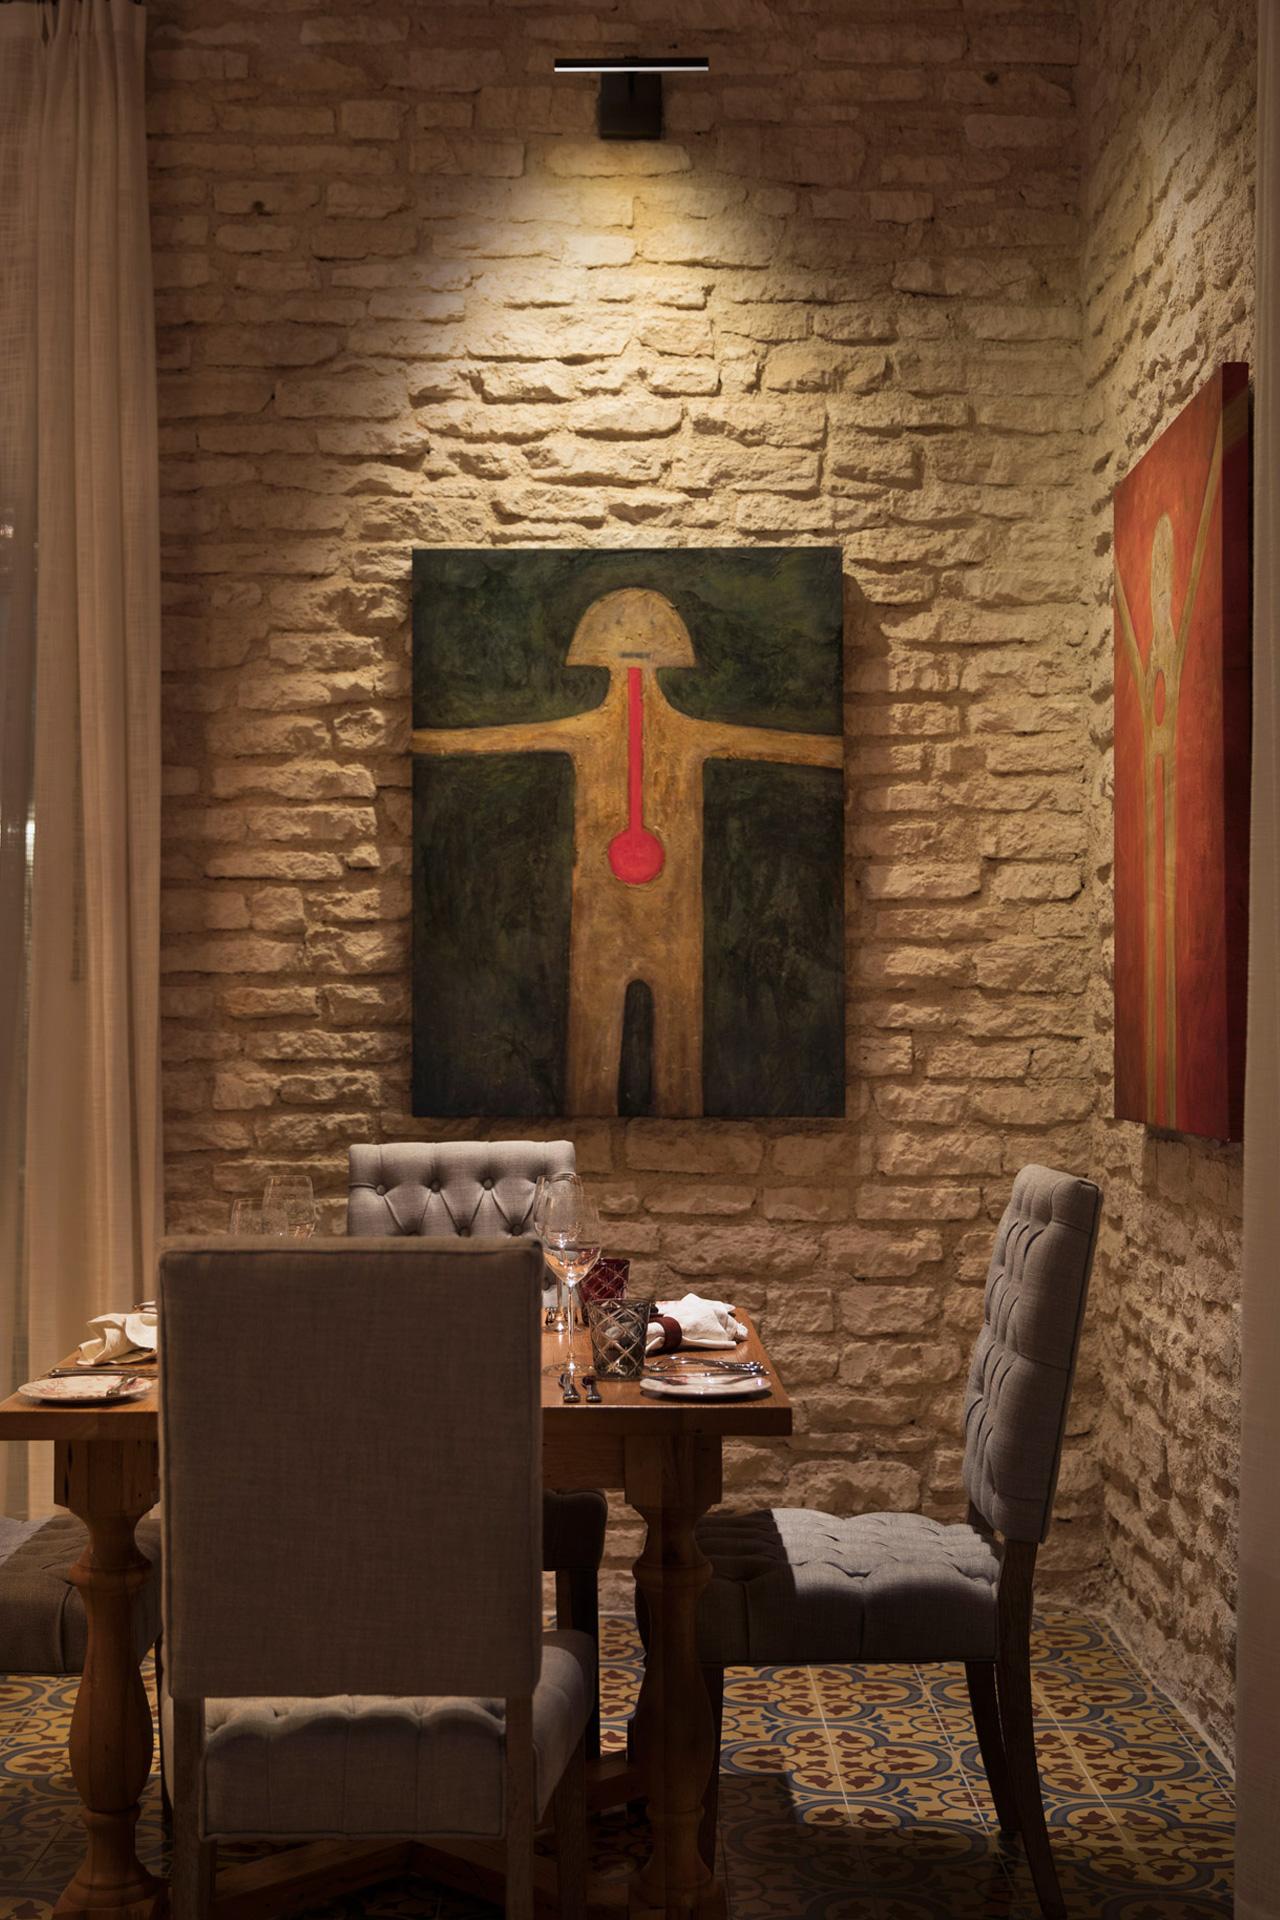 Casa Amate restaurant decor